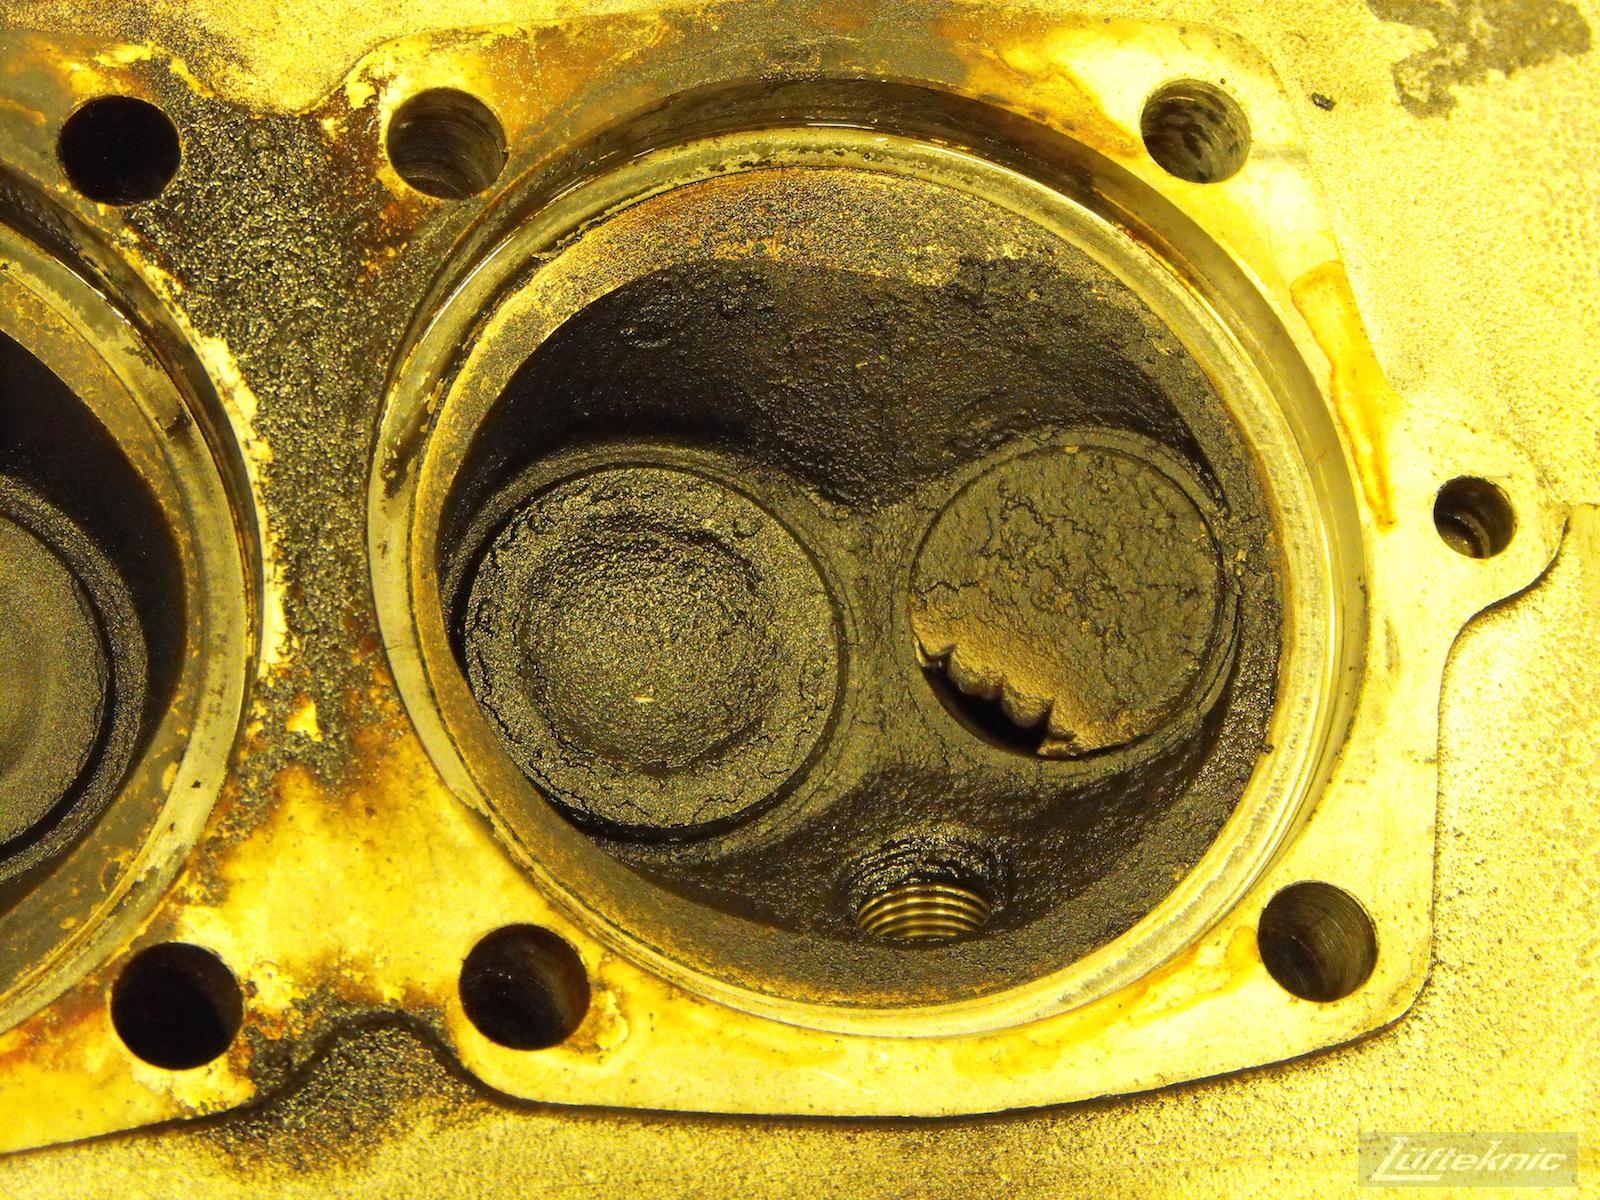 Valve damage on a 1961 Porsche 356B Roadster restoration.